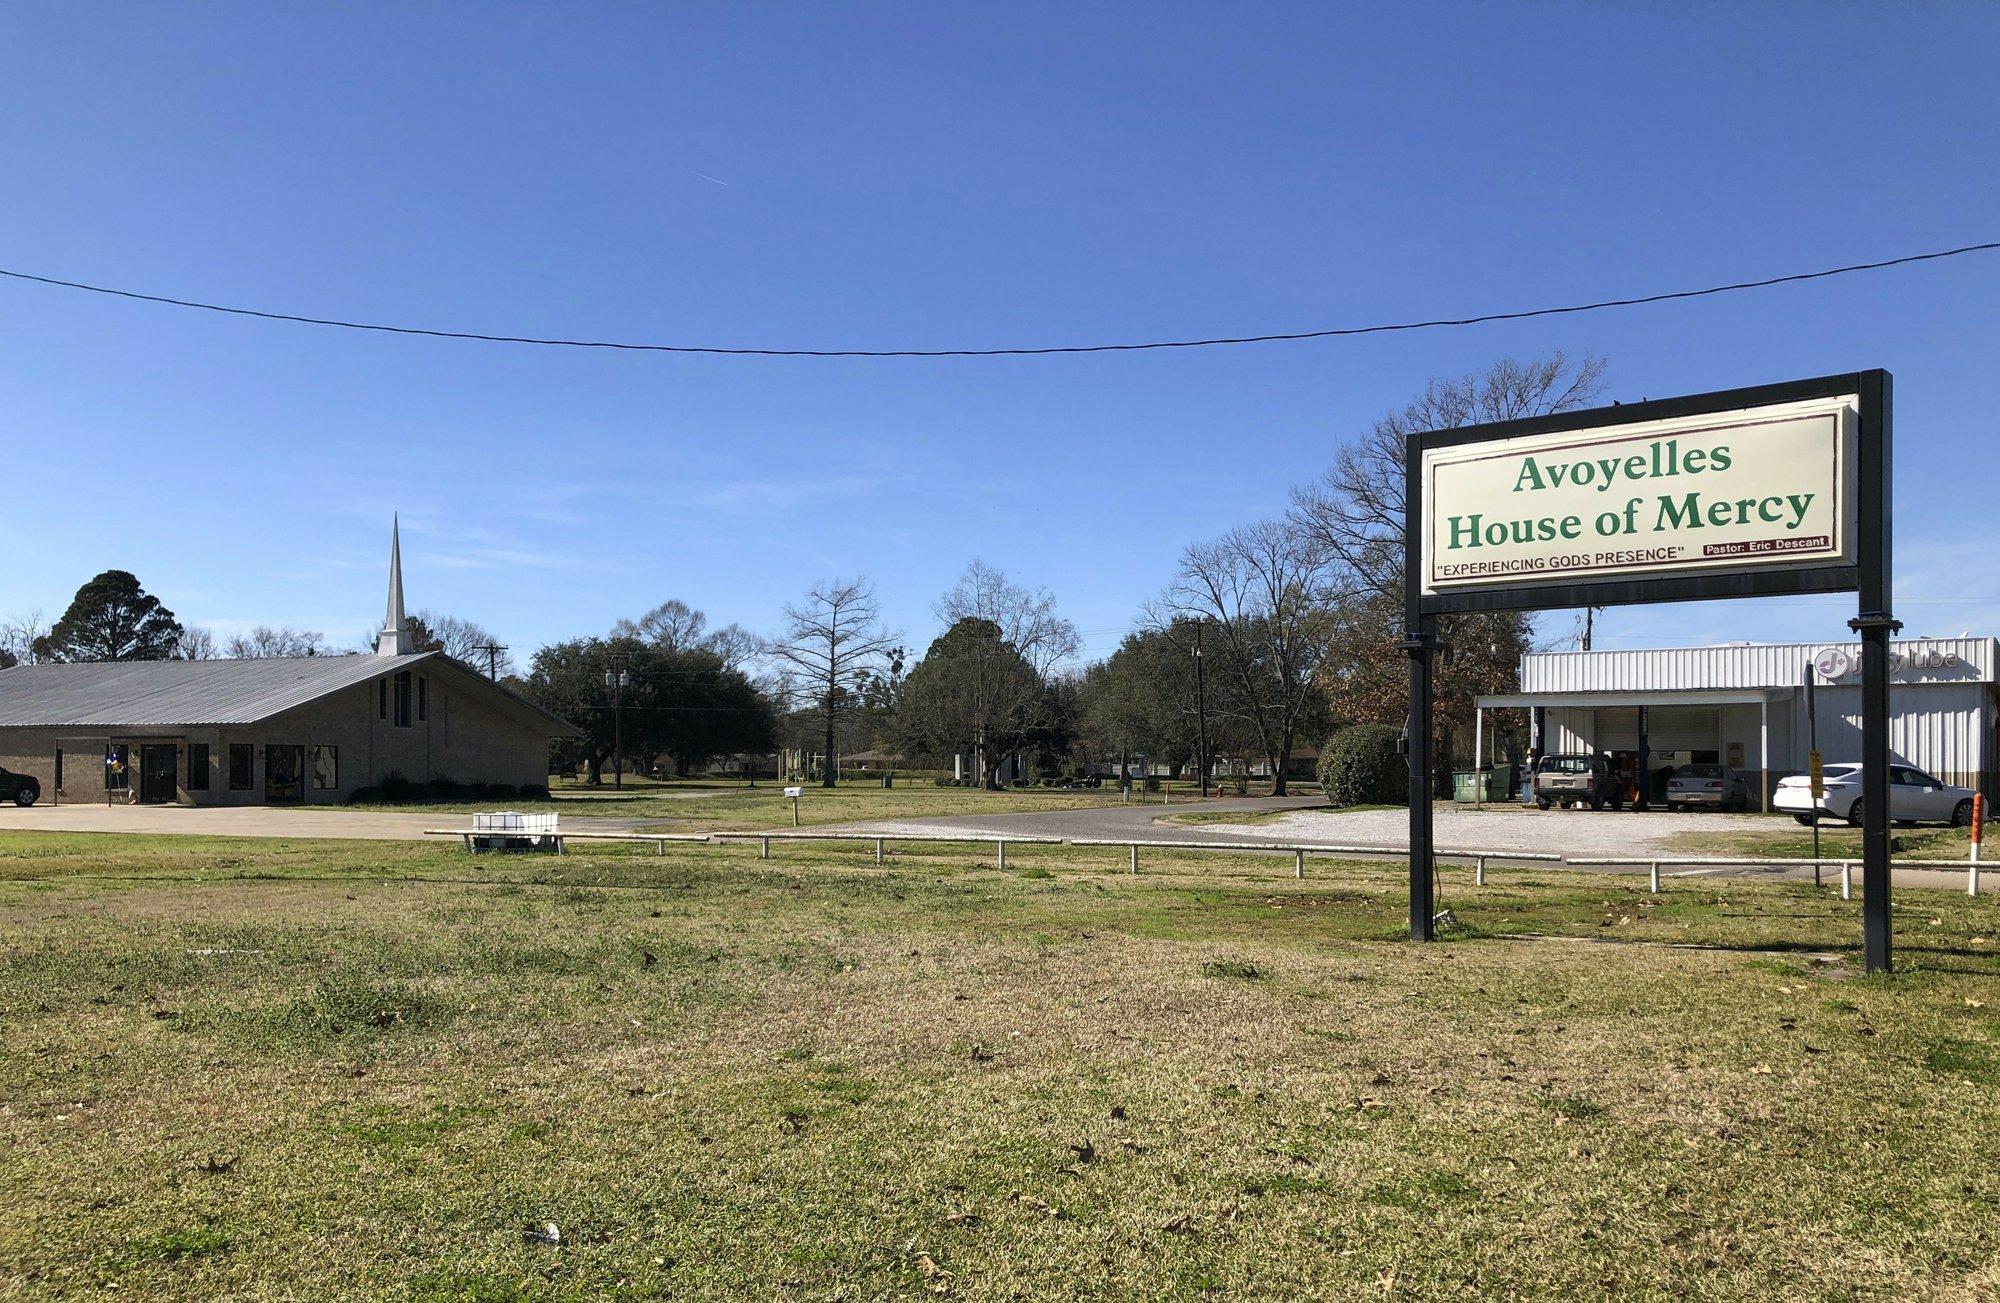 Louisiana town reels from loss of 5 children in fiery crash